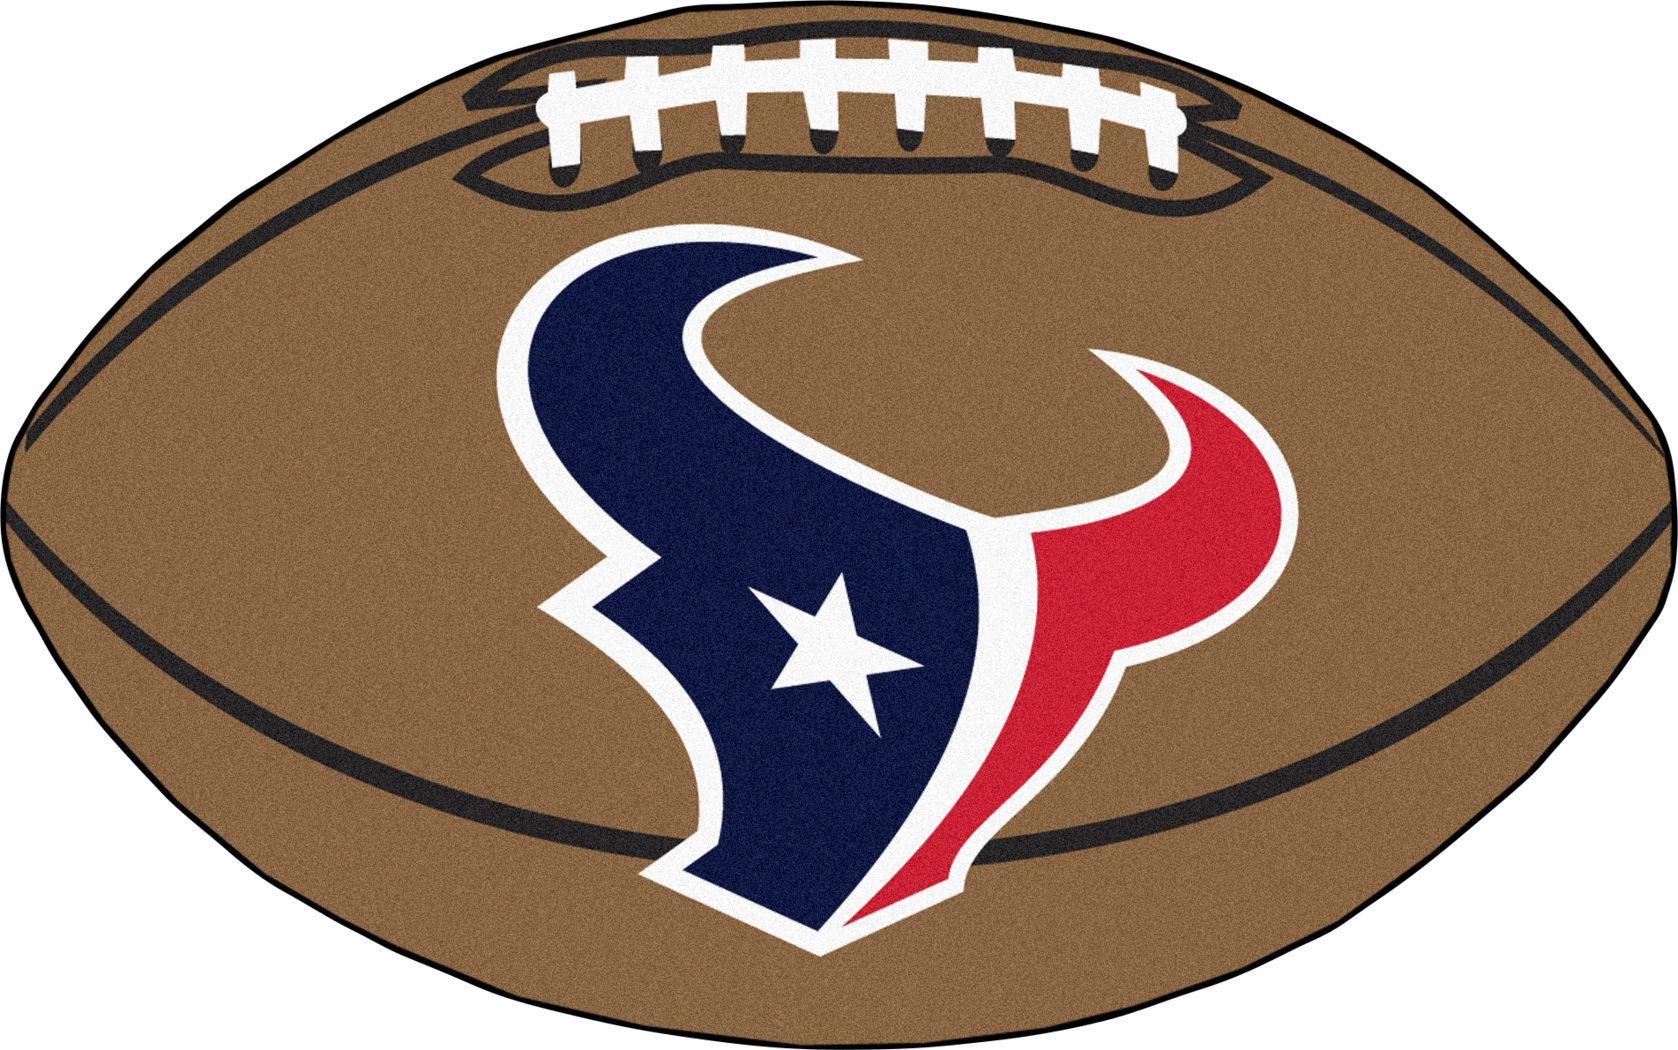 "NFL Football Mascot Houston Texans 1'6""x 1'10"" Rug"